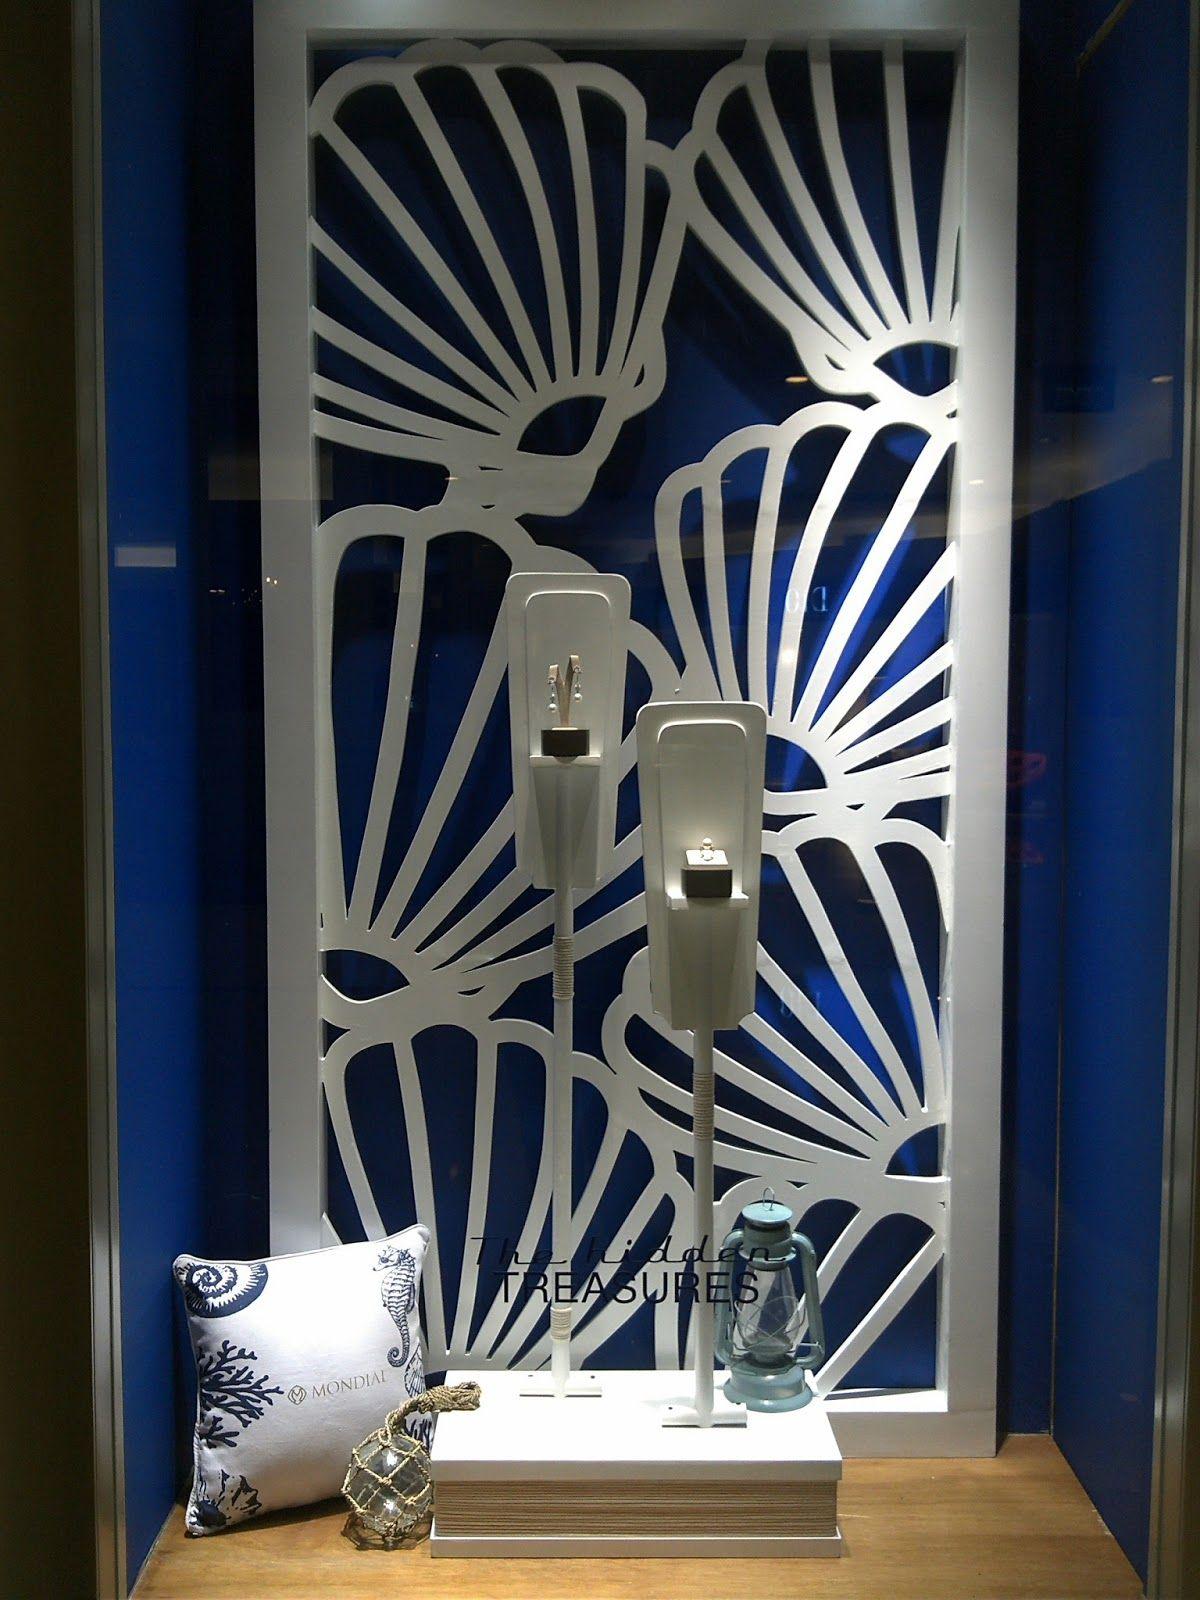 Window display ideas for jewelry  pin by caren on work work work  pinterest  display jewellery